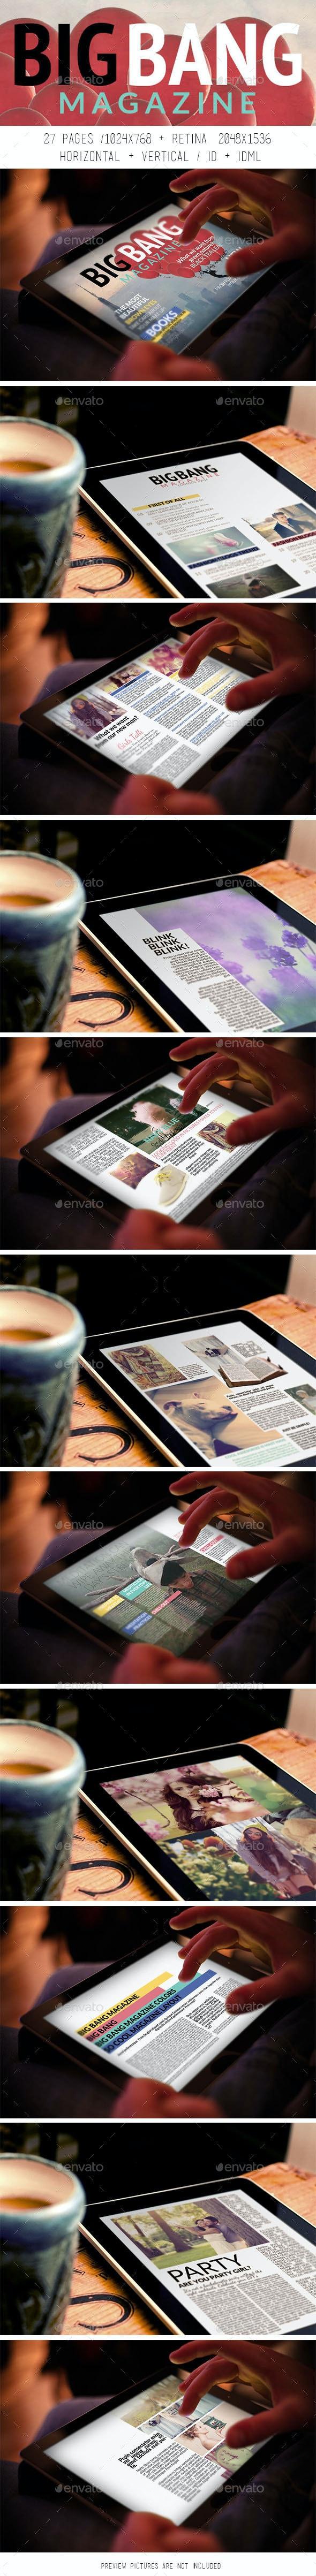 iPad & Tablet Big Bang Magazine - Digital Magazines ePublishing